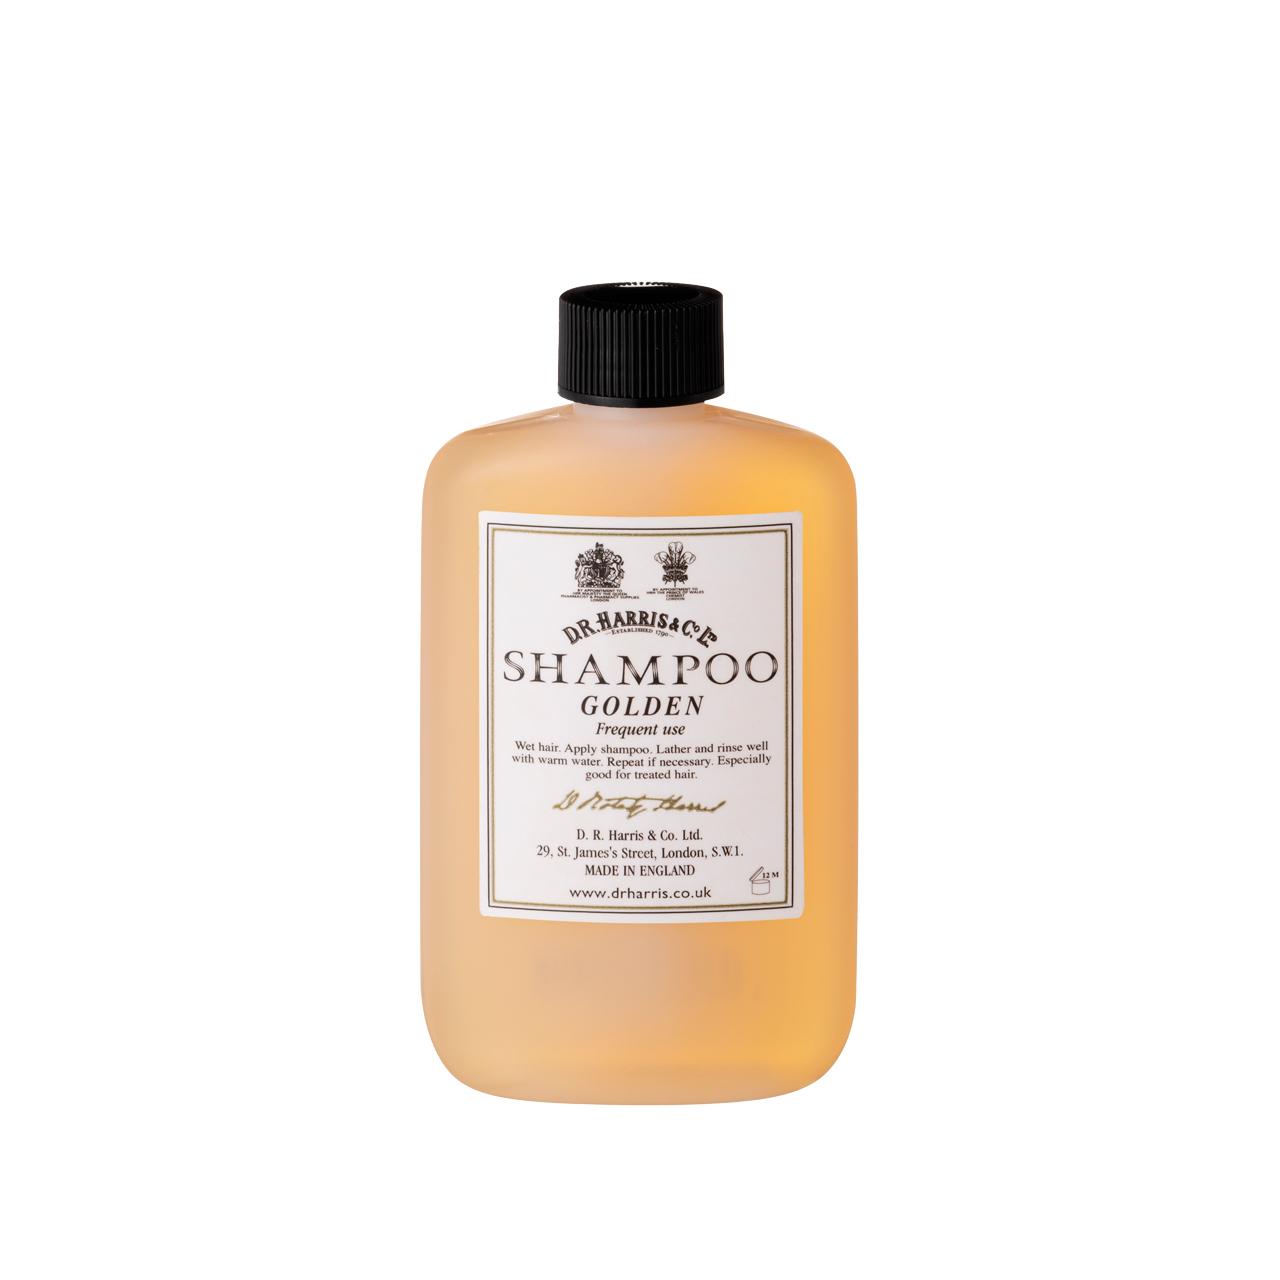 Golden - Shampoo